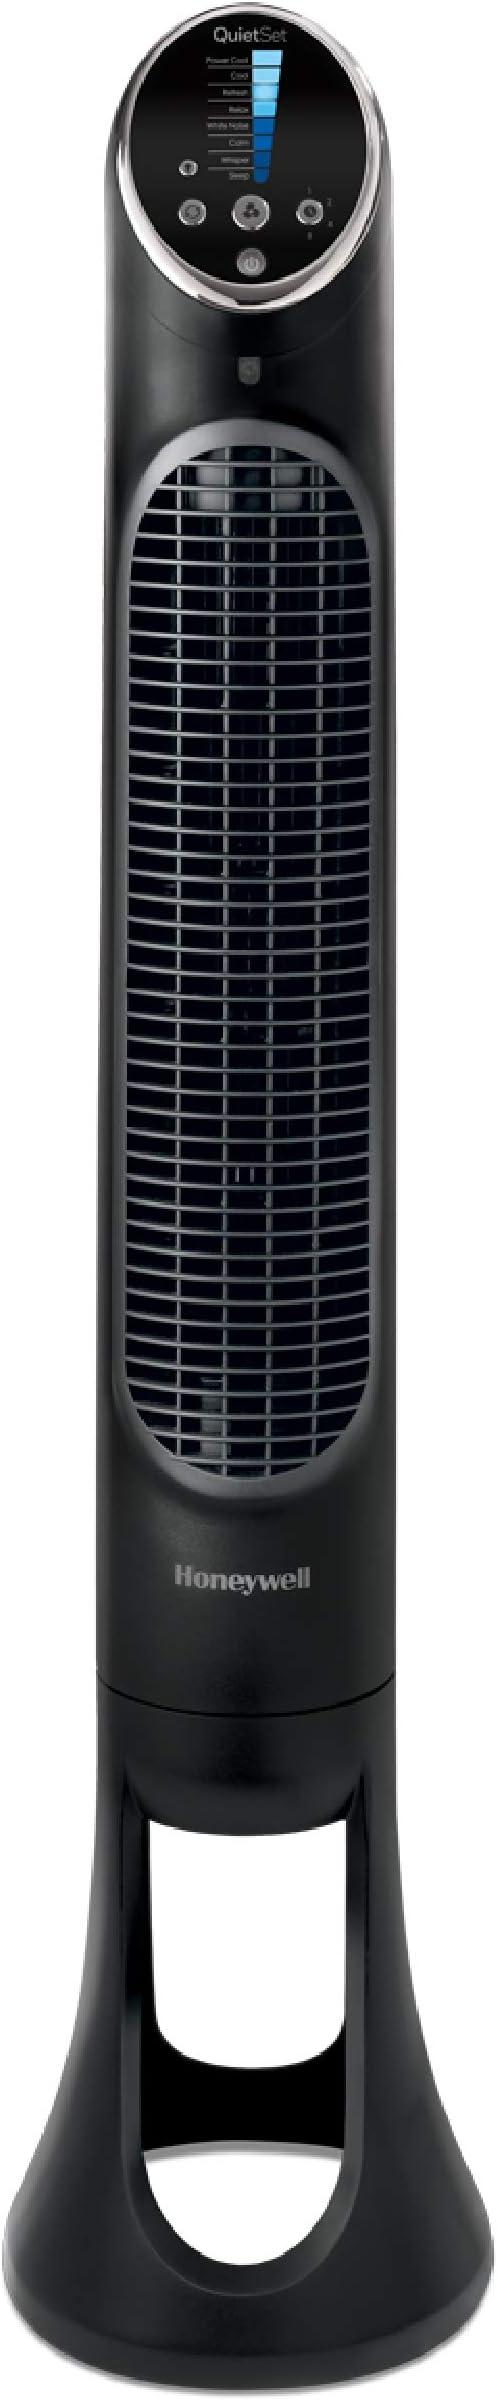 Honeywell QuietSet Whole Room Tower Fan-Black, HYF290B